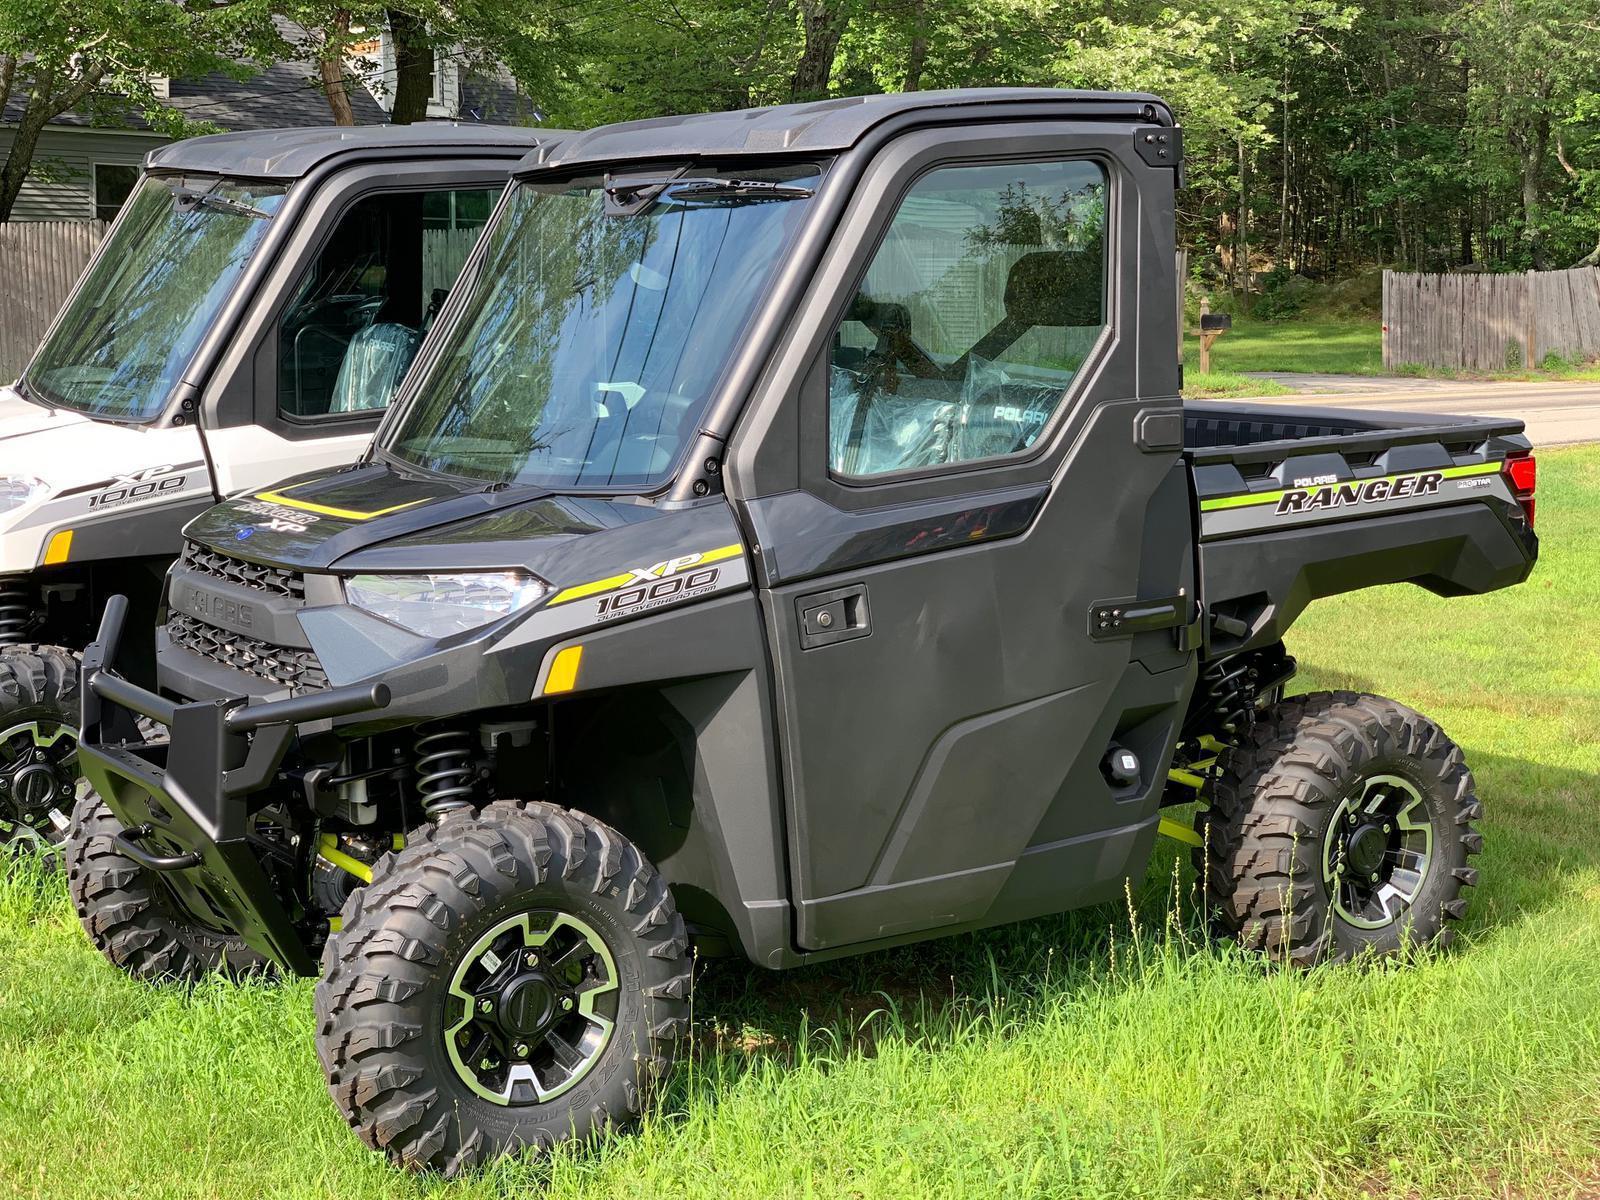 2019 Polaris Industries RANGER XP® 1000 EPS NorthStar Edition - Gray